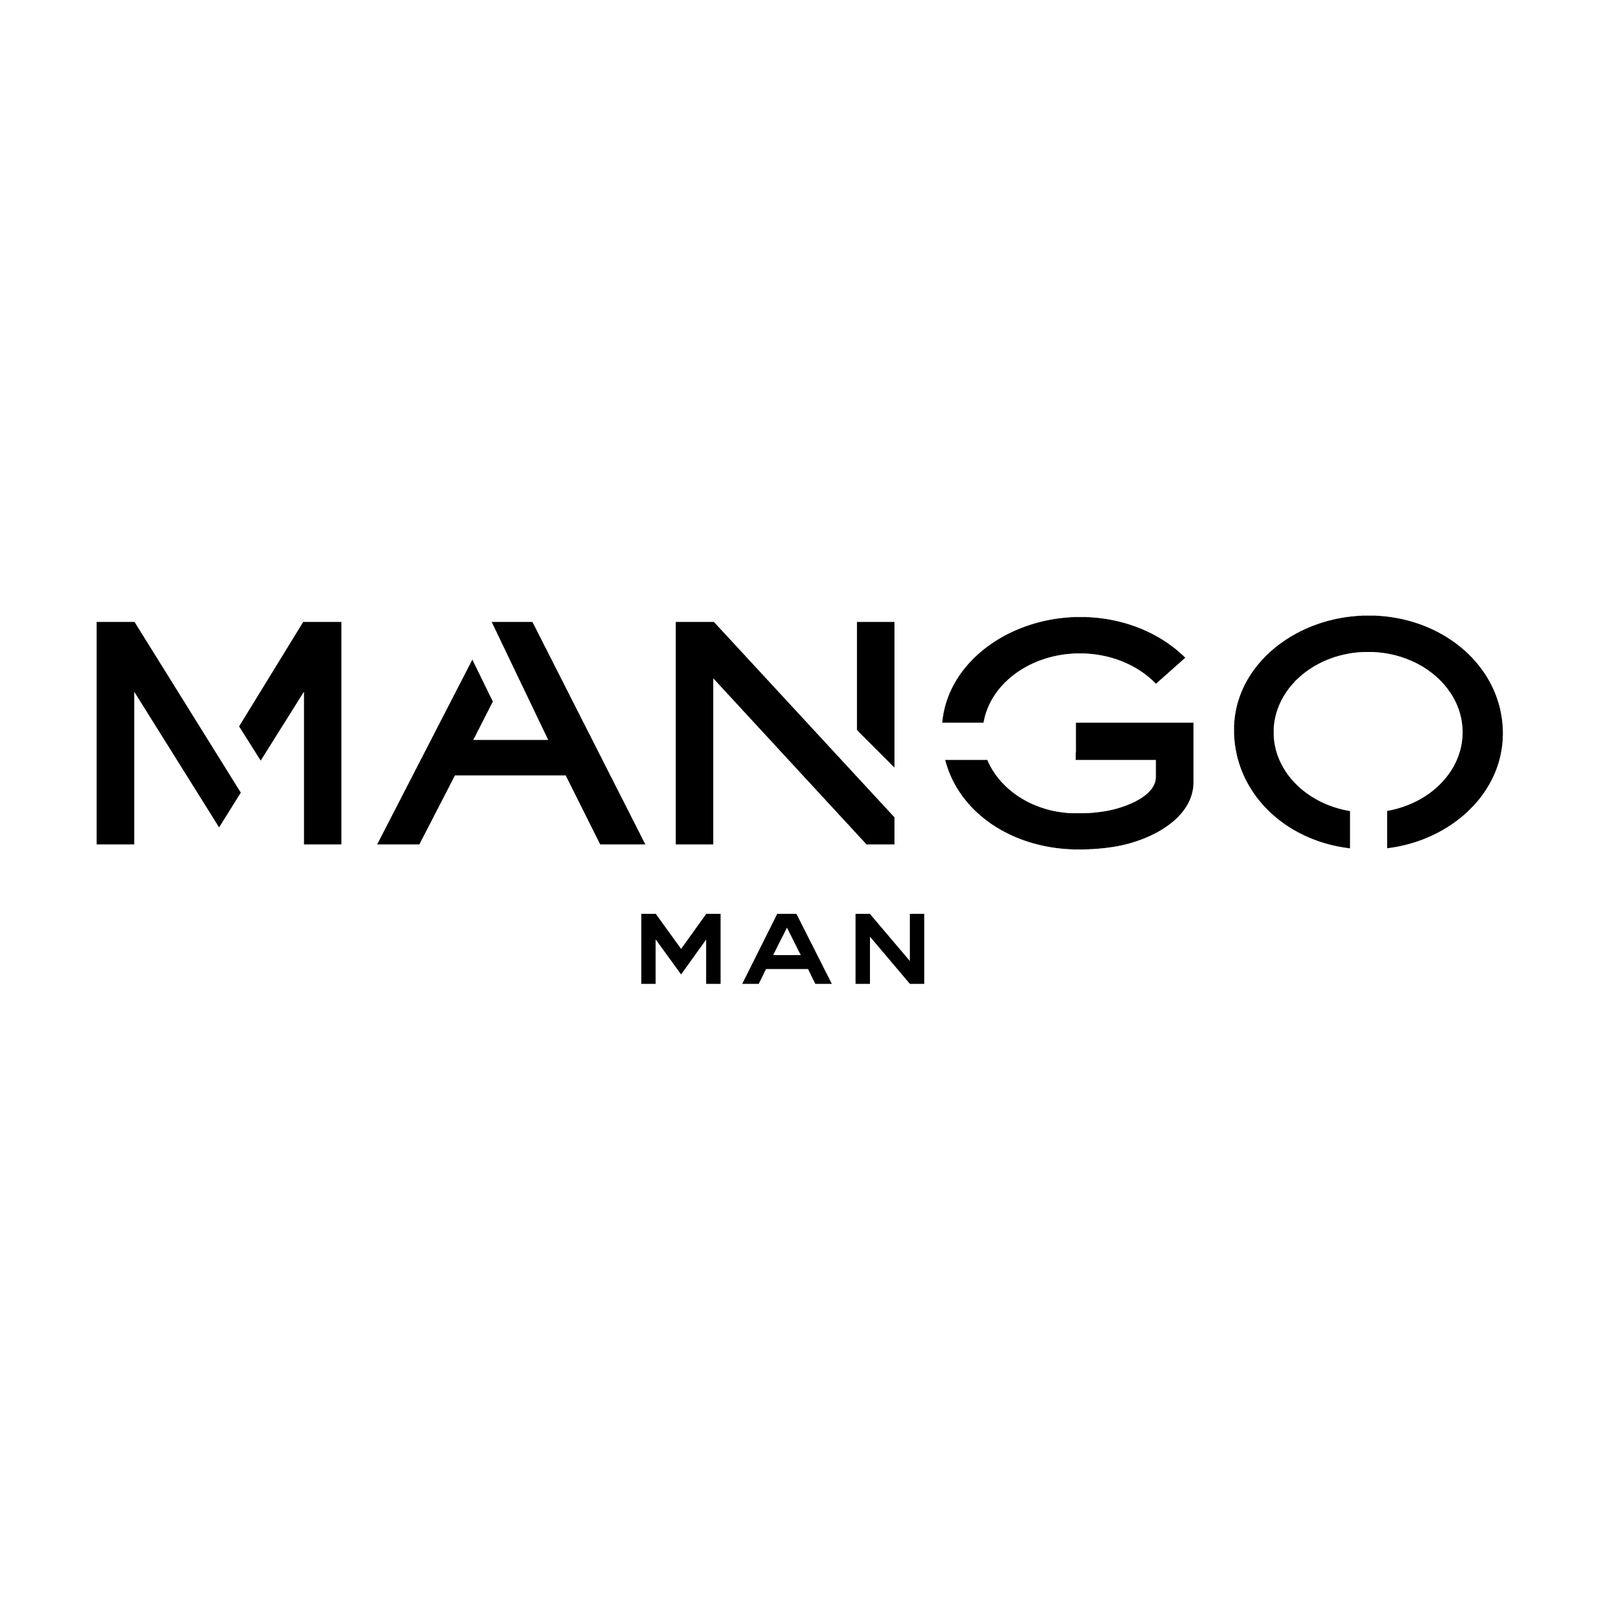 MANGO Man (Image 1)